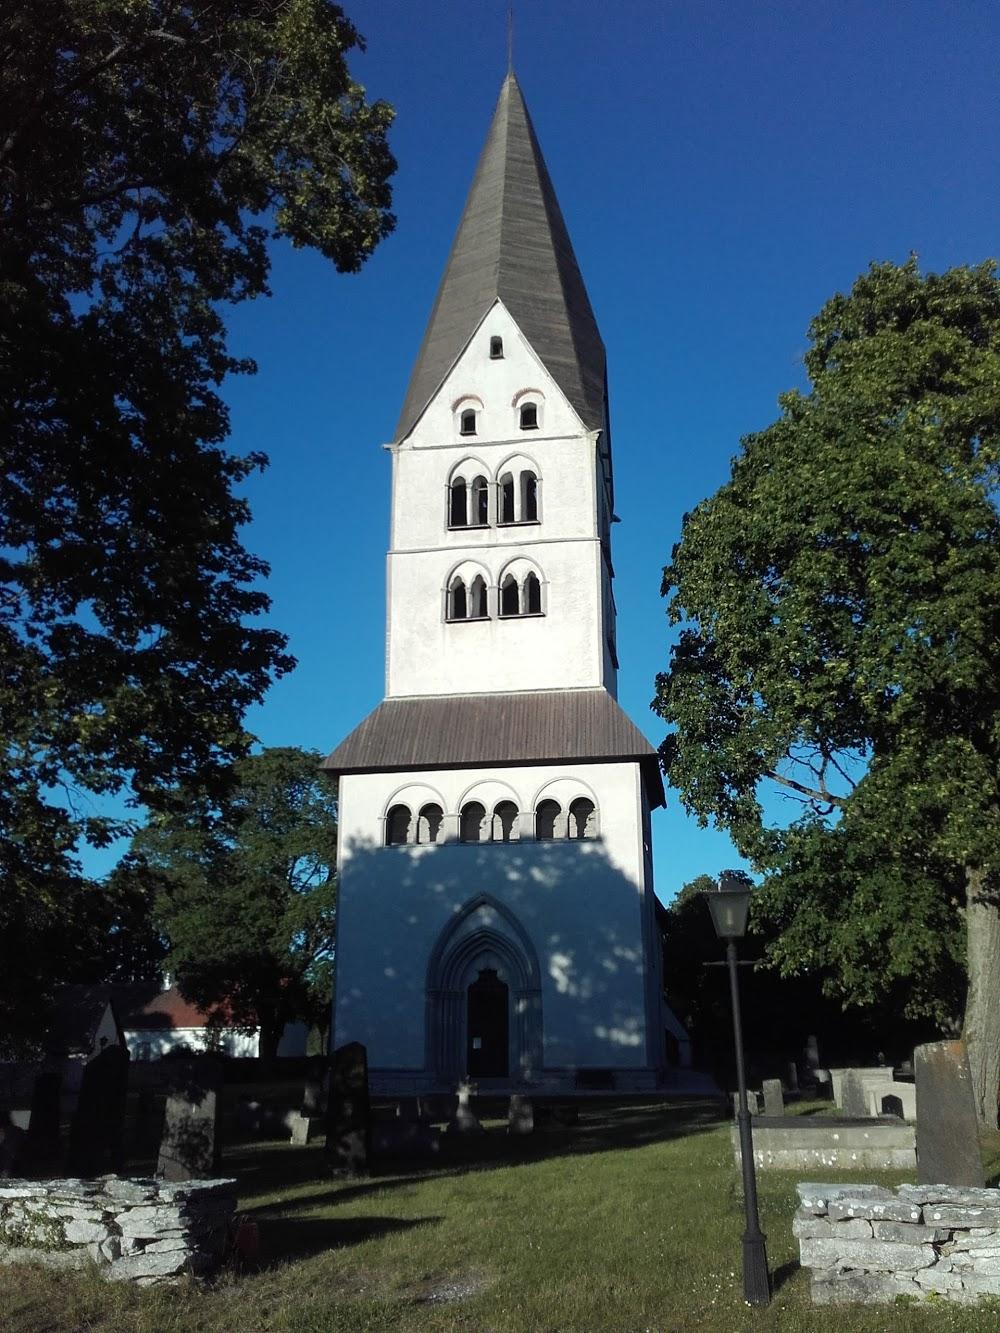 Elinghem öde kyrka